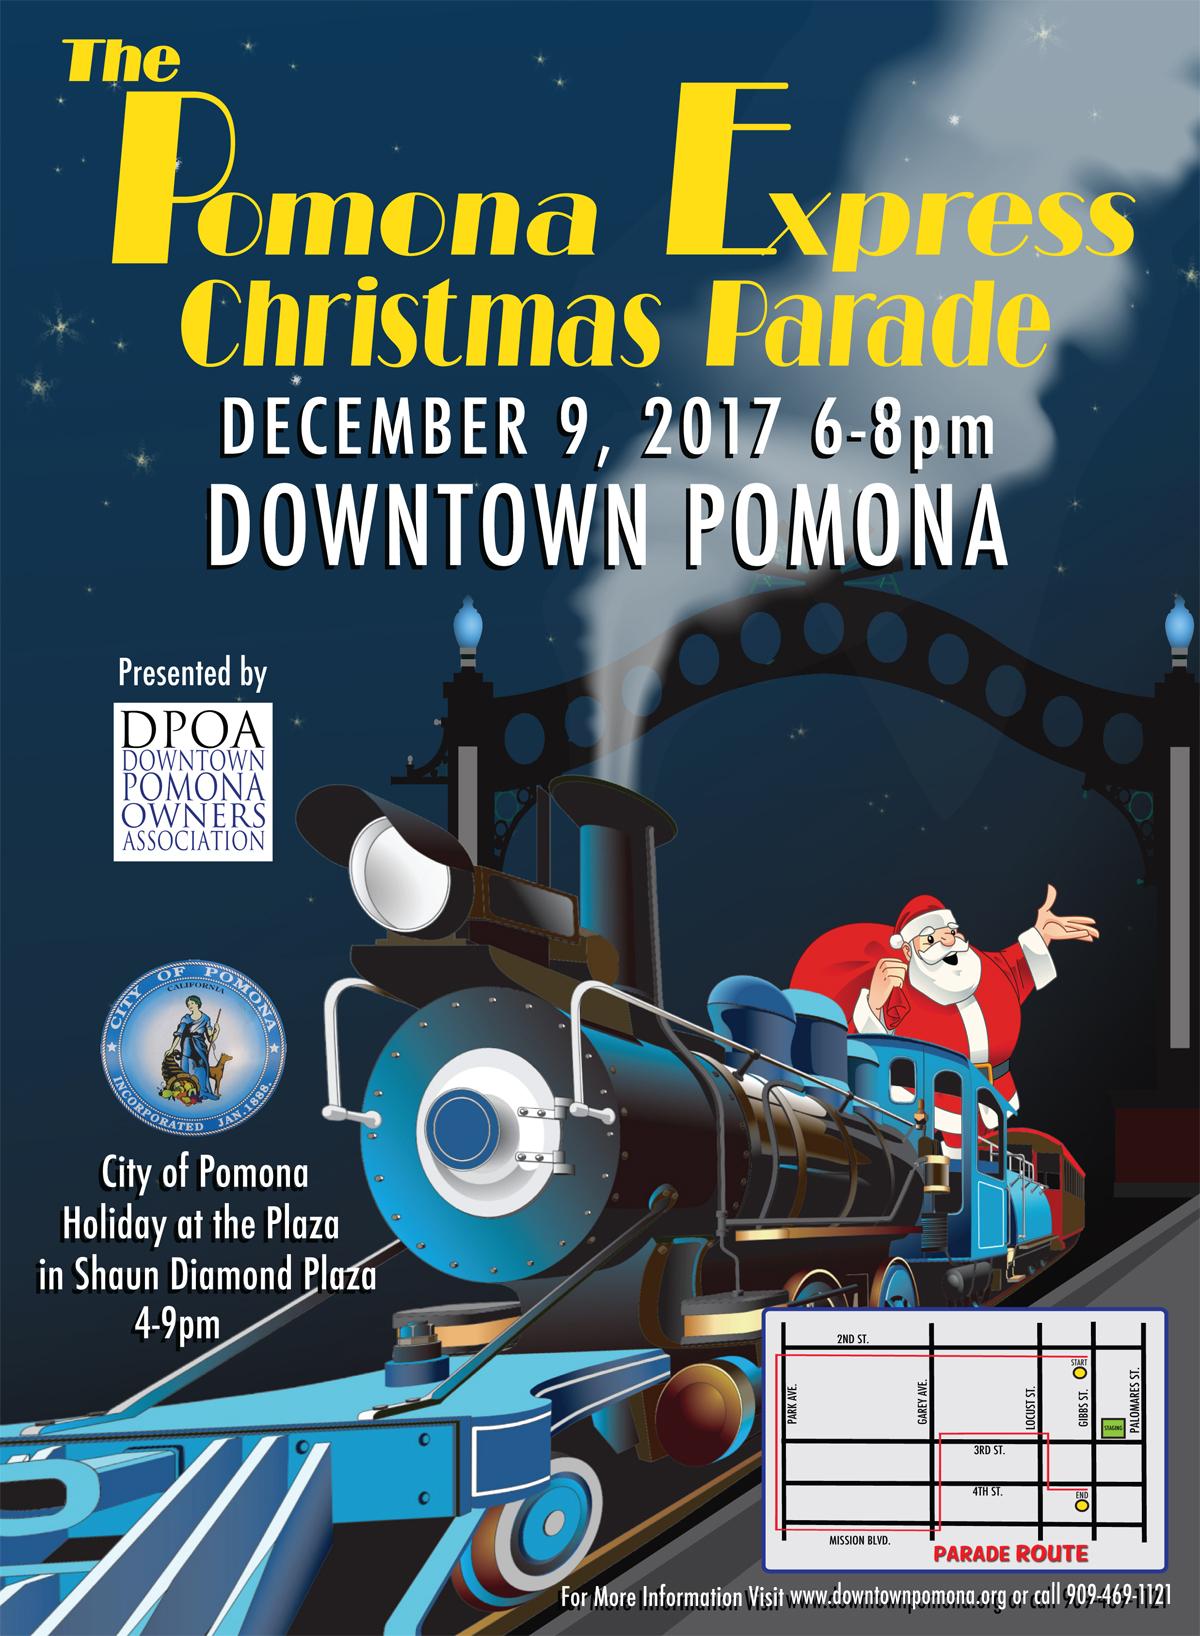 Pomona Christmas Parade 2019 The Pomona Express Christmas Parade   Pomona Chamber of Commerce